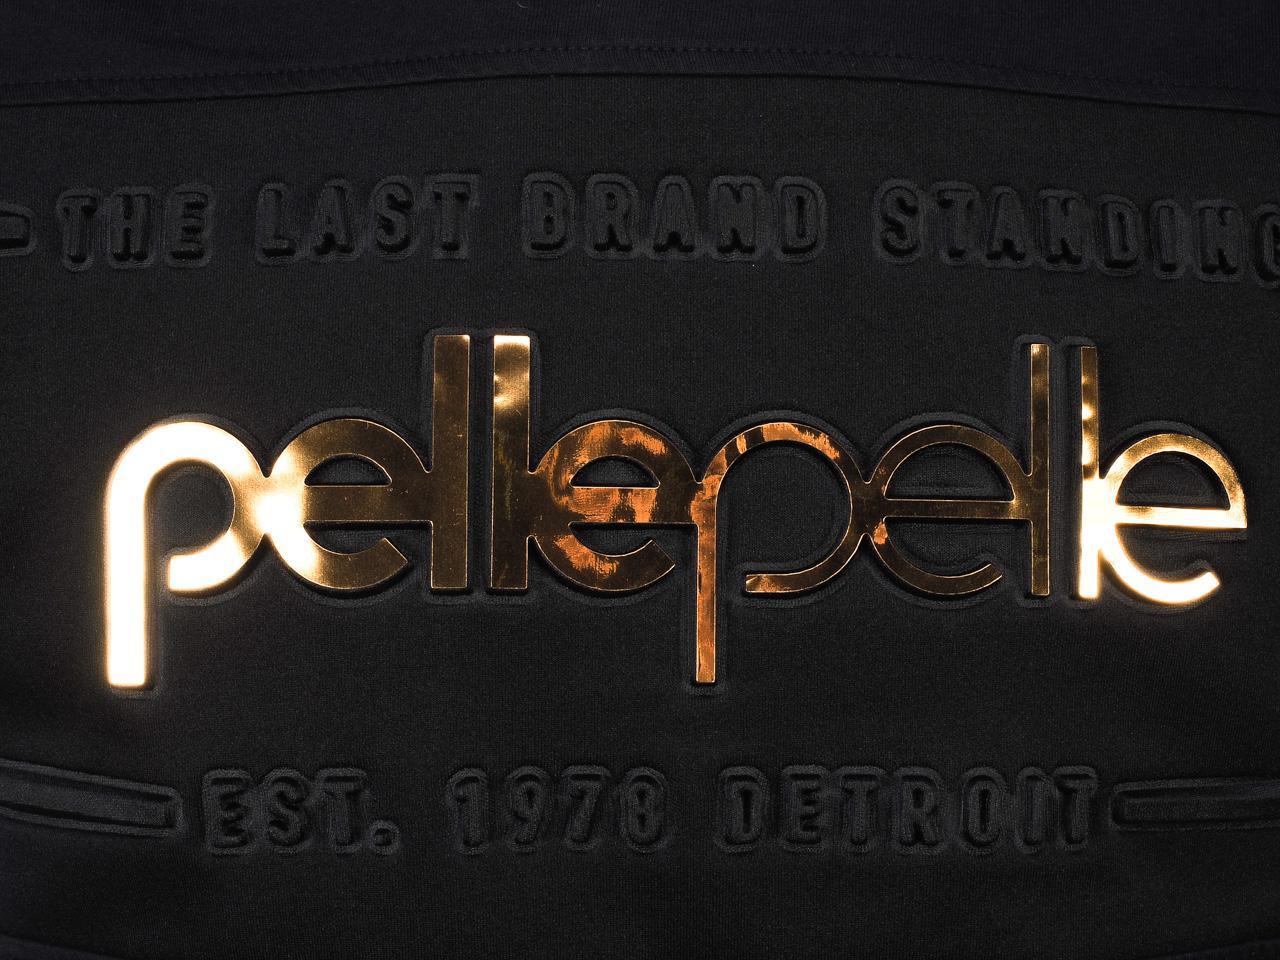 Short-Sleeve-T-Shirt-Pellepelle-Tee-Black-Gold-Black-77639-New thumbnail 3